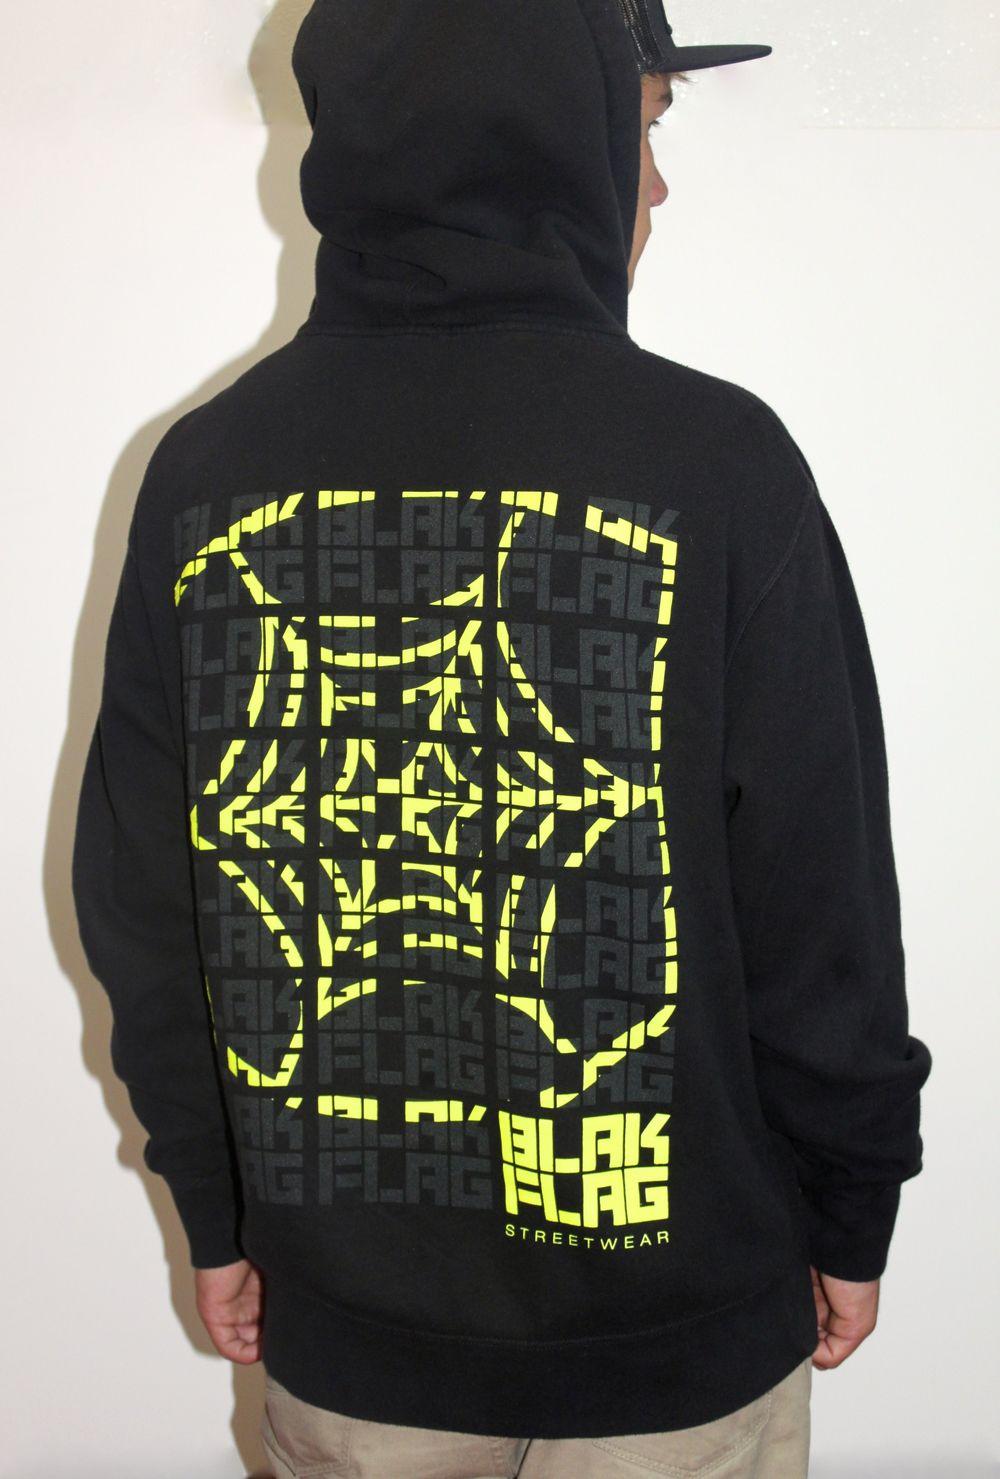 sweatshirt-bk.jpg